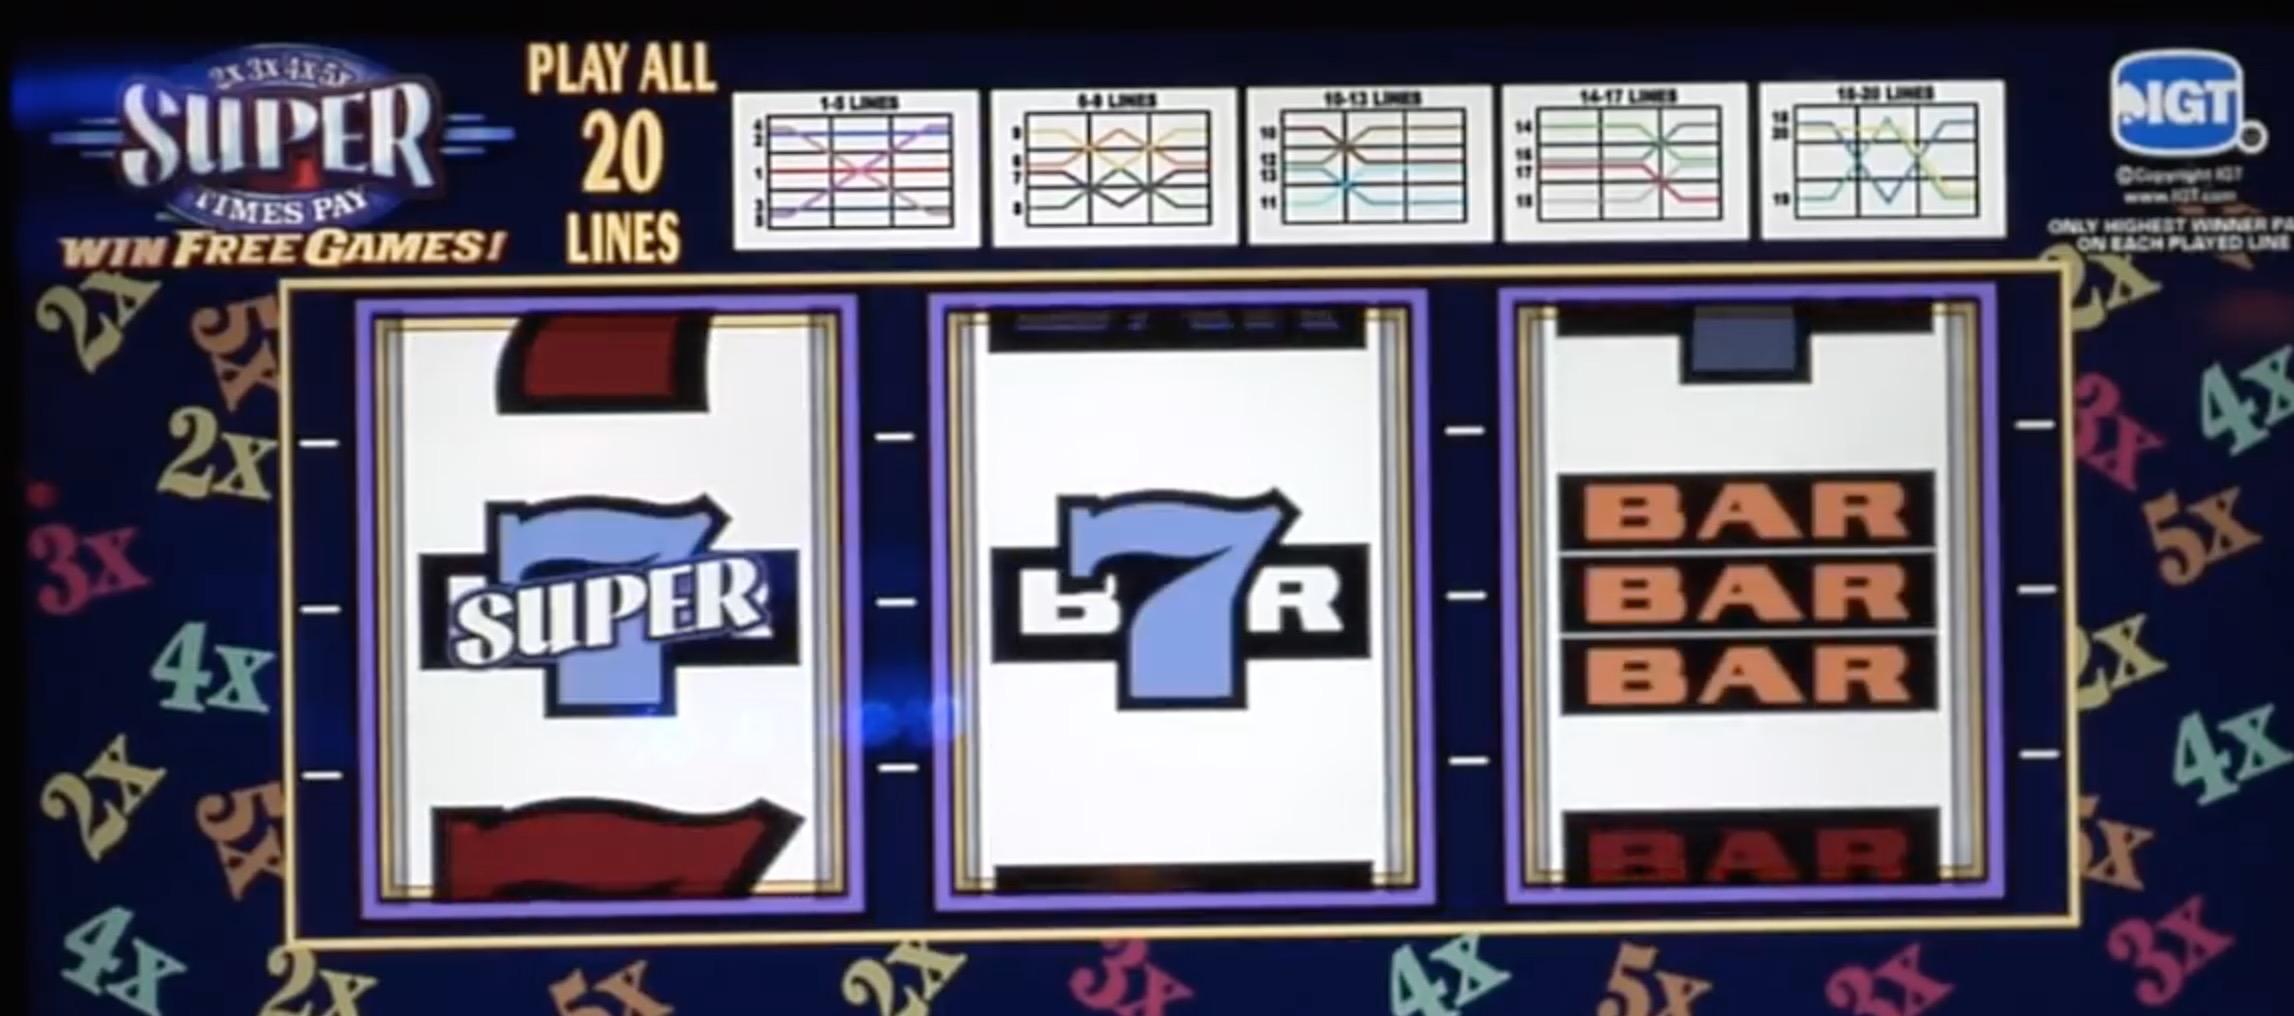 Slot machines put on table in gambling talks